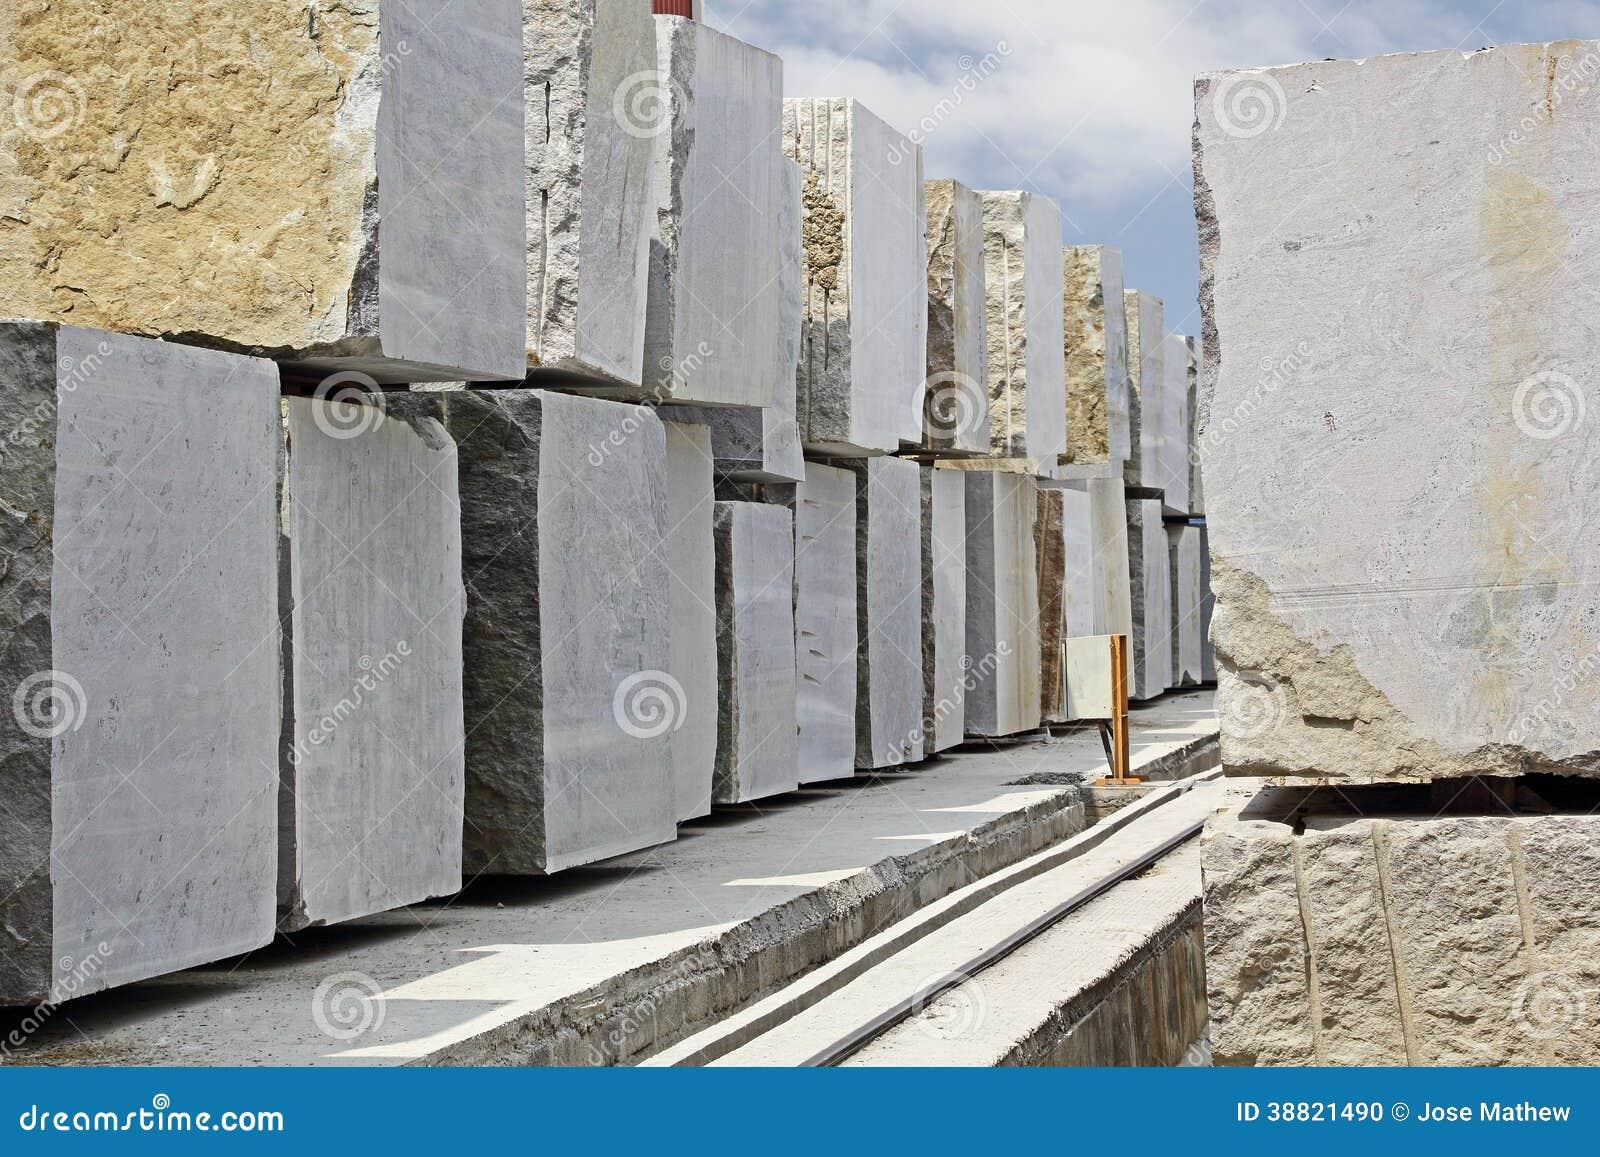 Granite Stone Blocks : Huge granite blocks extracted from quarry stock photo